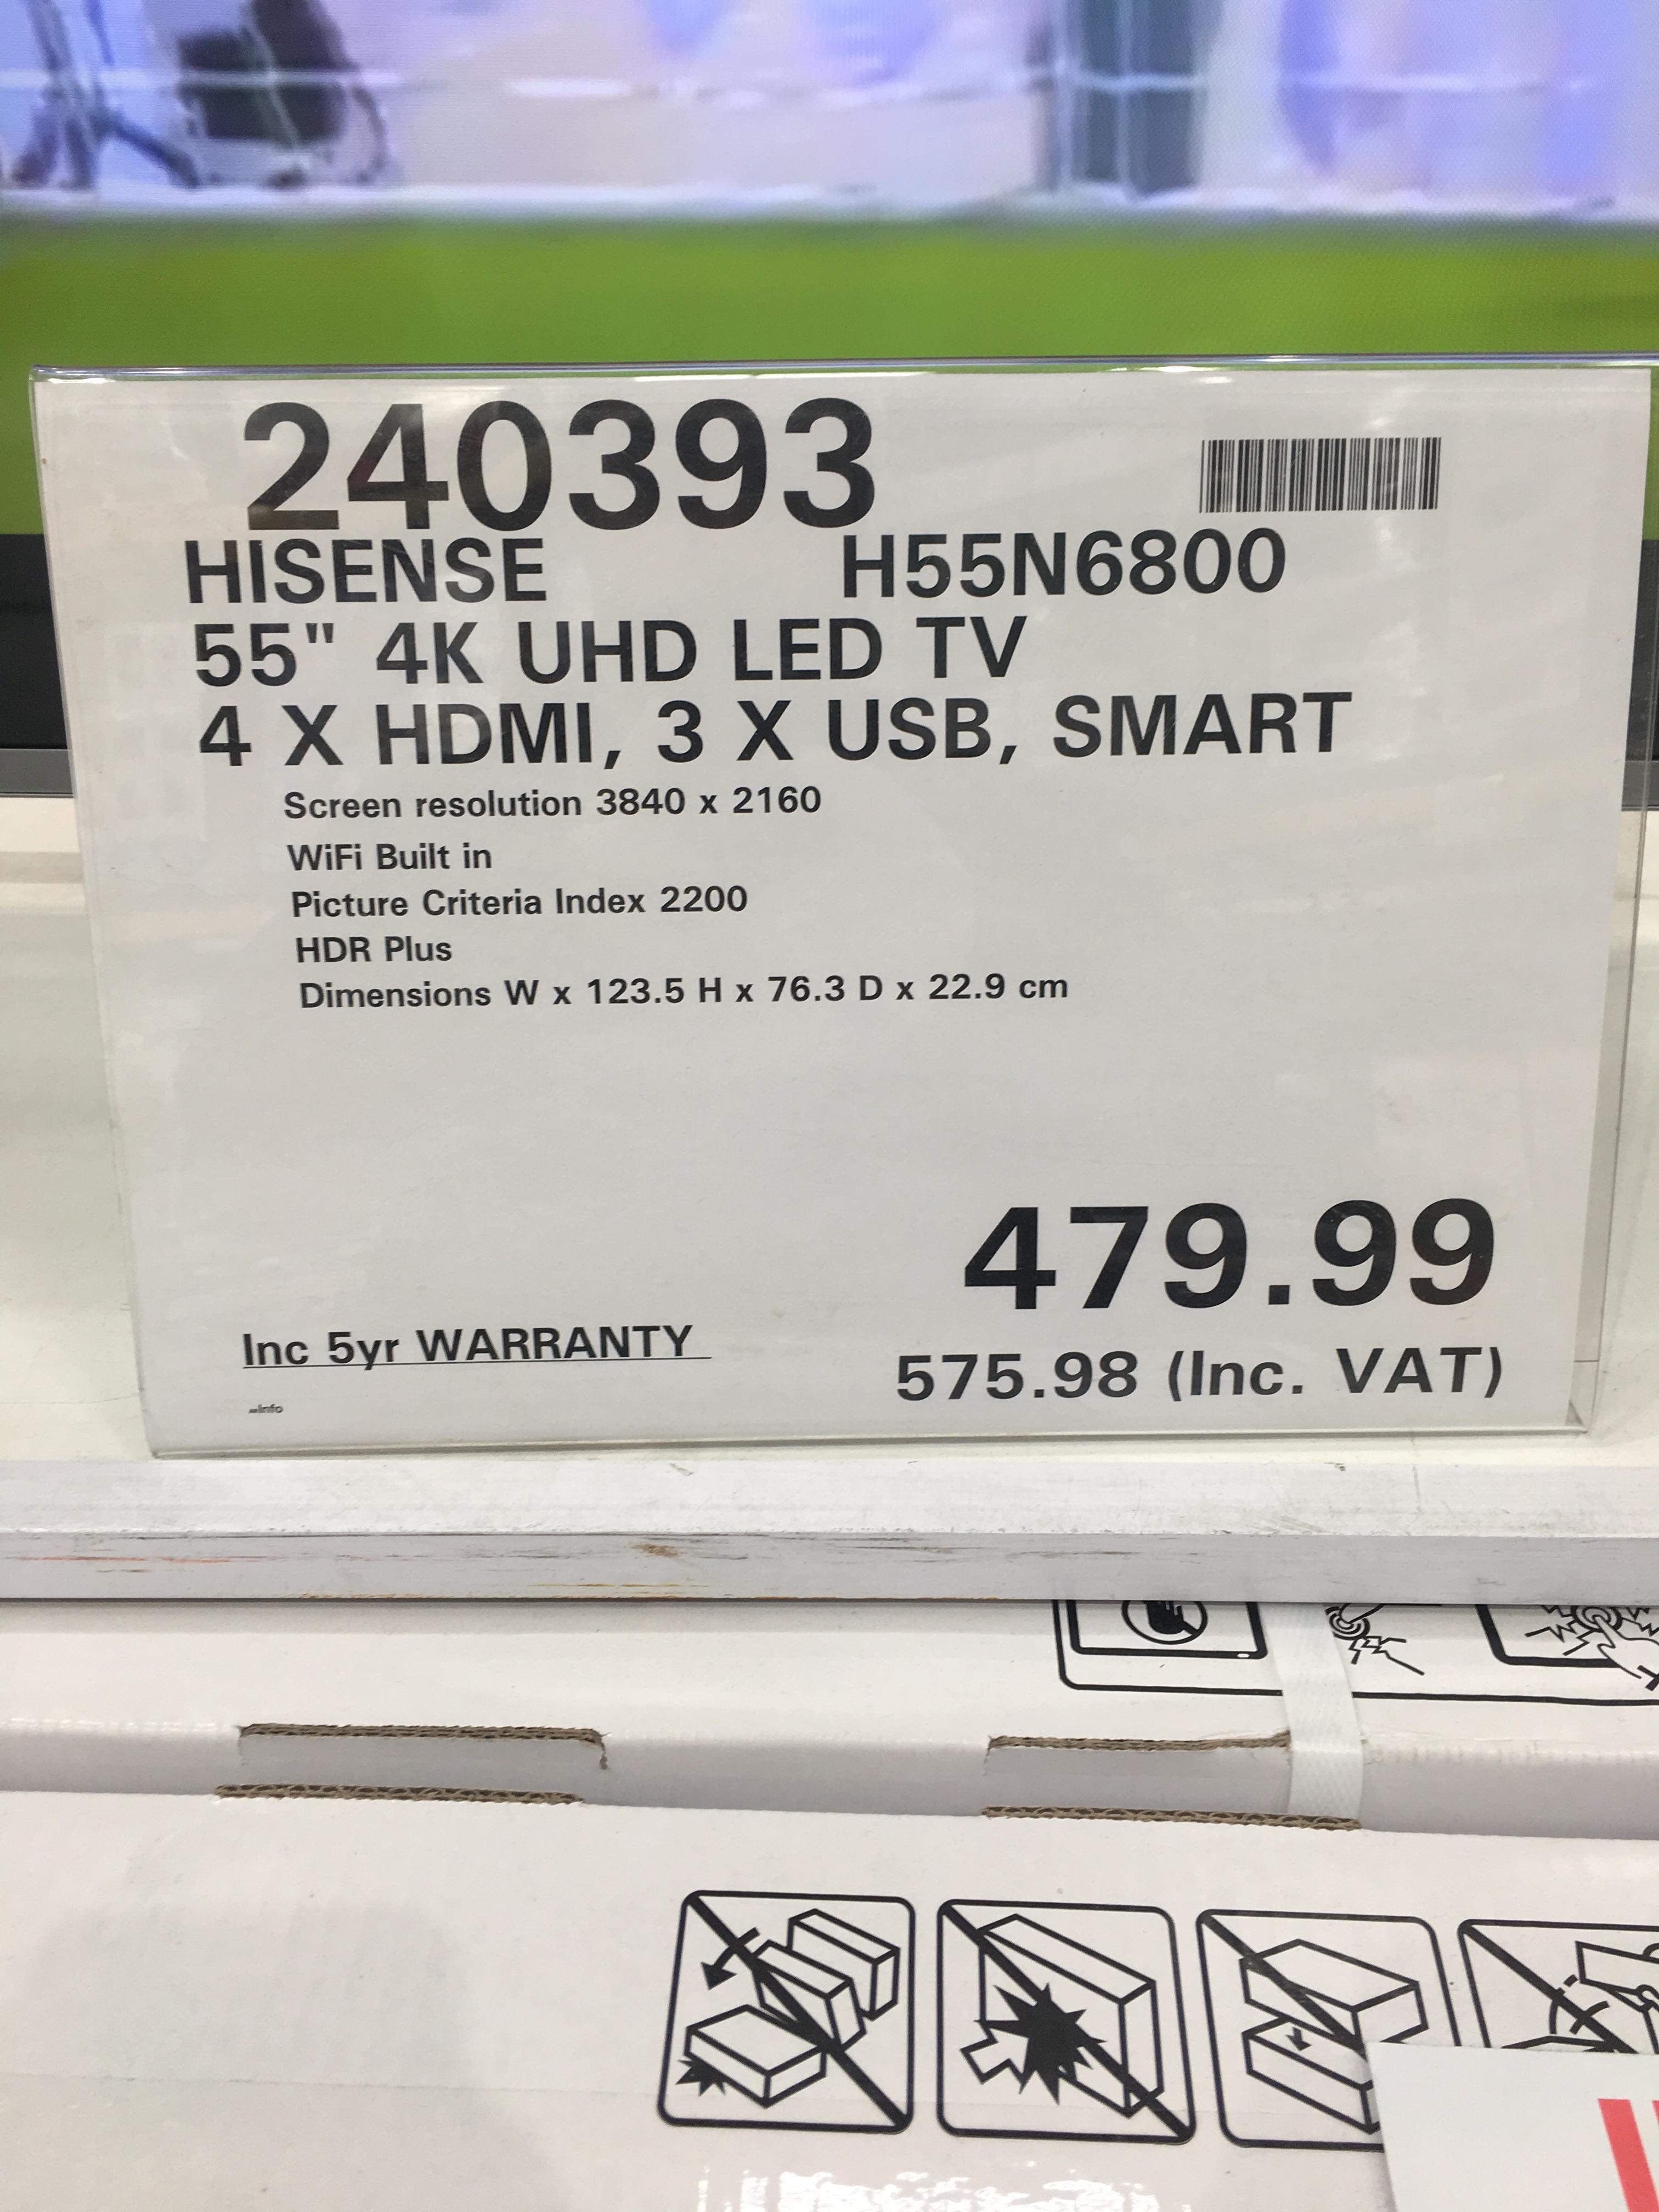 HiSense H55N6800 - £575.98 instore @ Costco (Edinburgh)